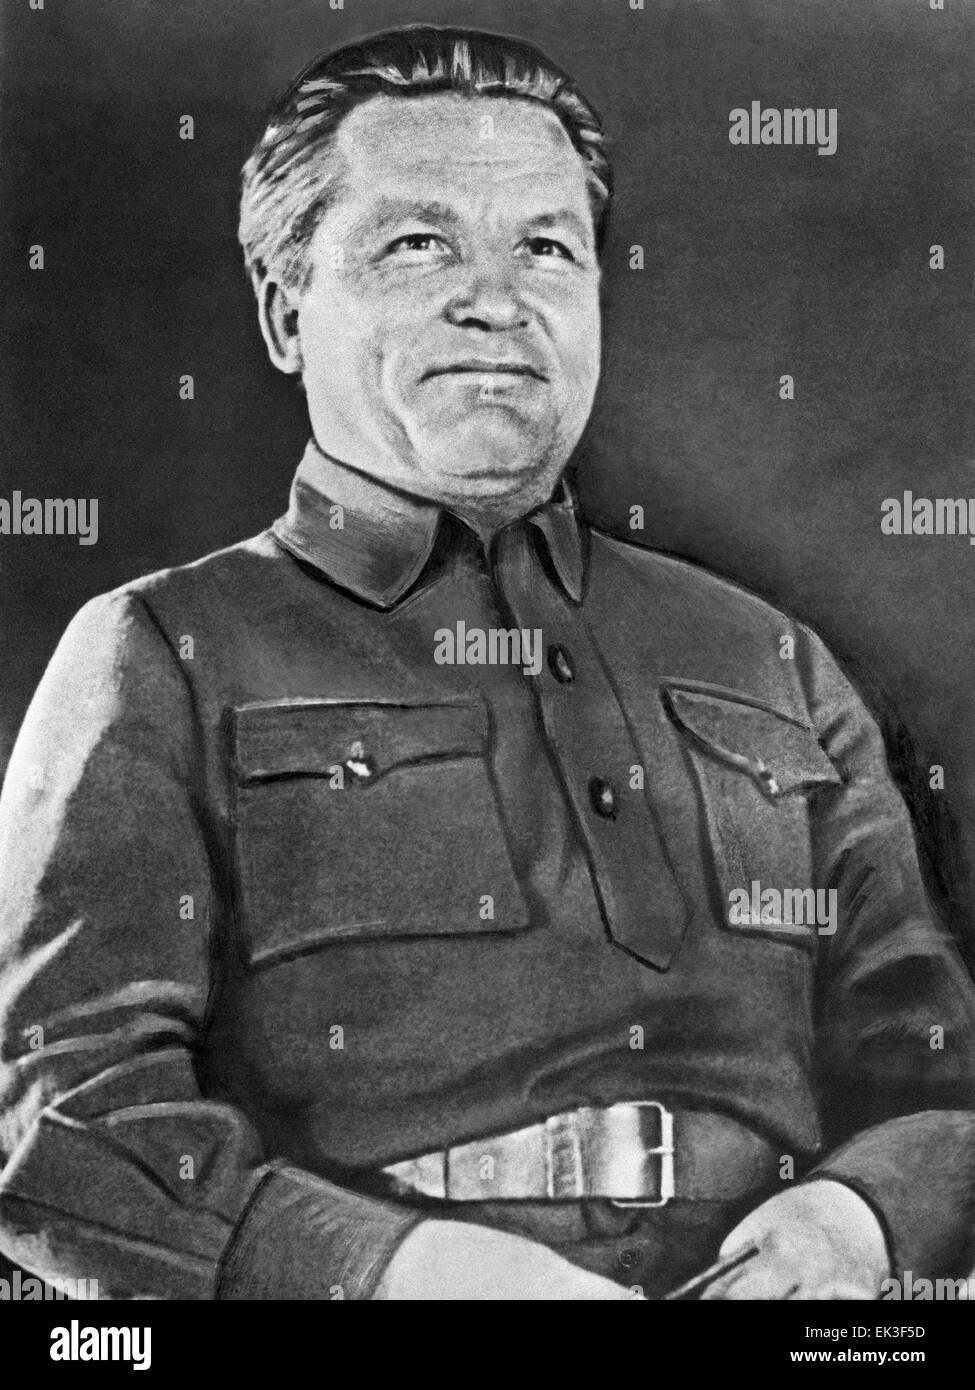 LENINGRAD, USSR. Soviet political leader Sergey Kirov at a regional Communist party conference. - Stock Image